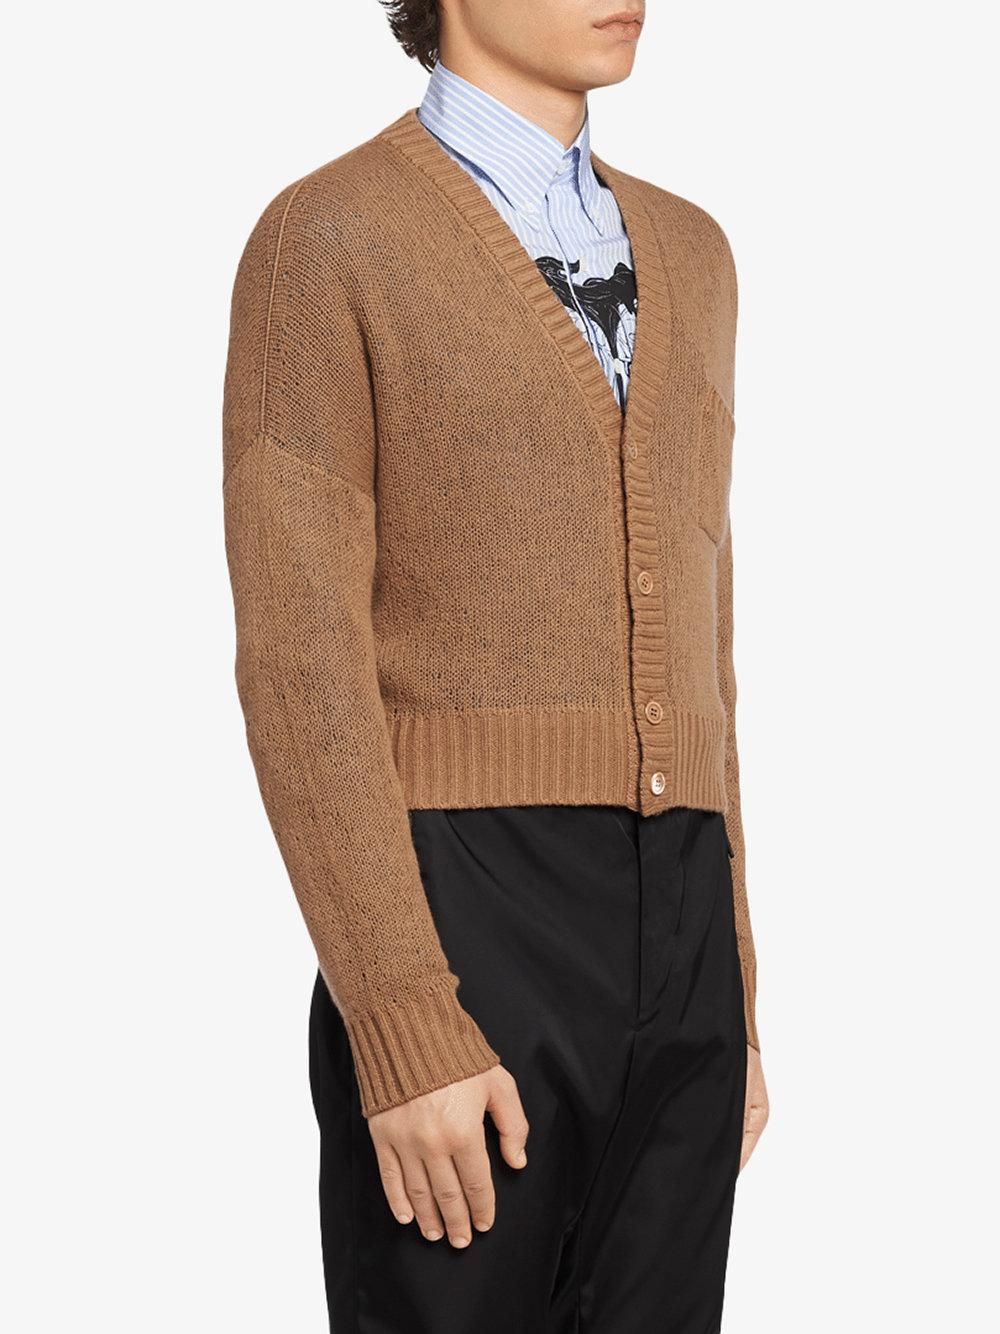 Prada Cashmere Ribbed V-neck Cardigan in Brown for Men